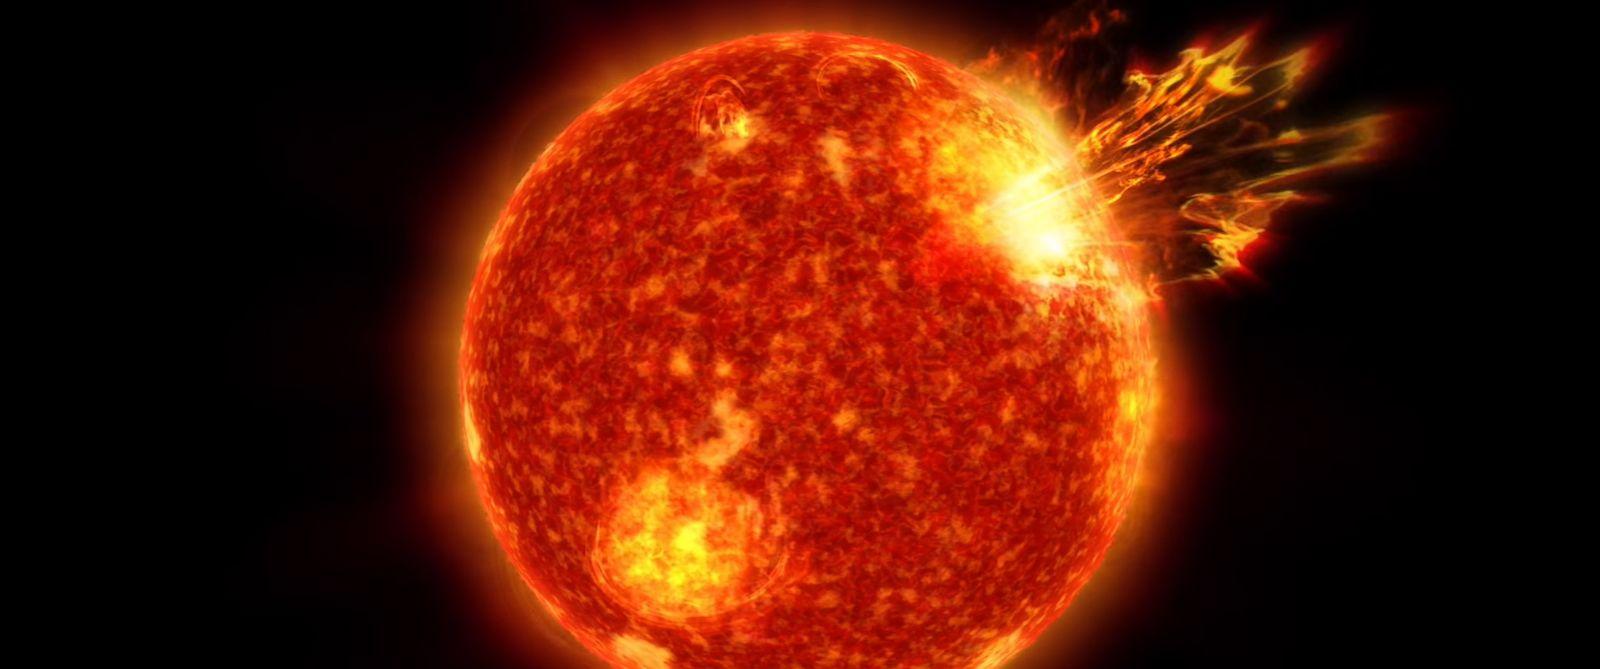 solar storm update news - photo #15